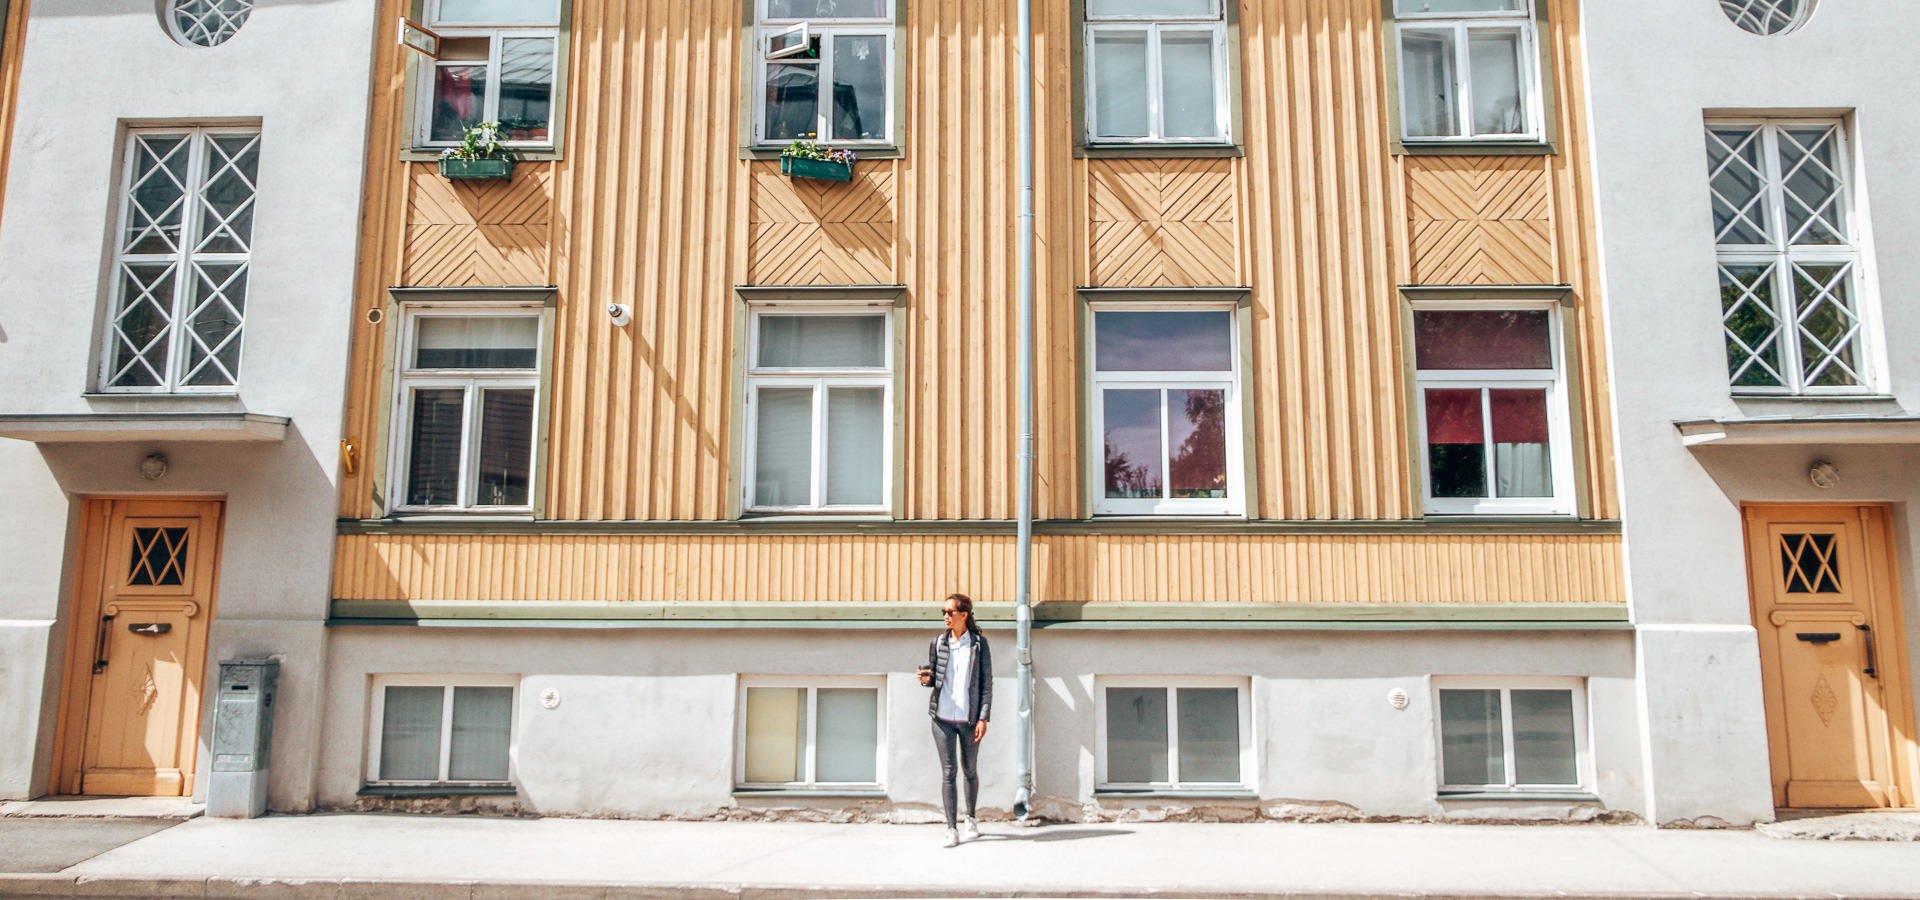 Where To Find Specialty Coffee in Tallinn | coffee in tallinn 4